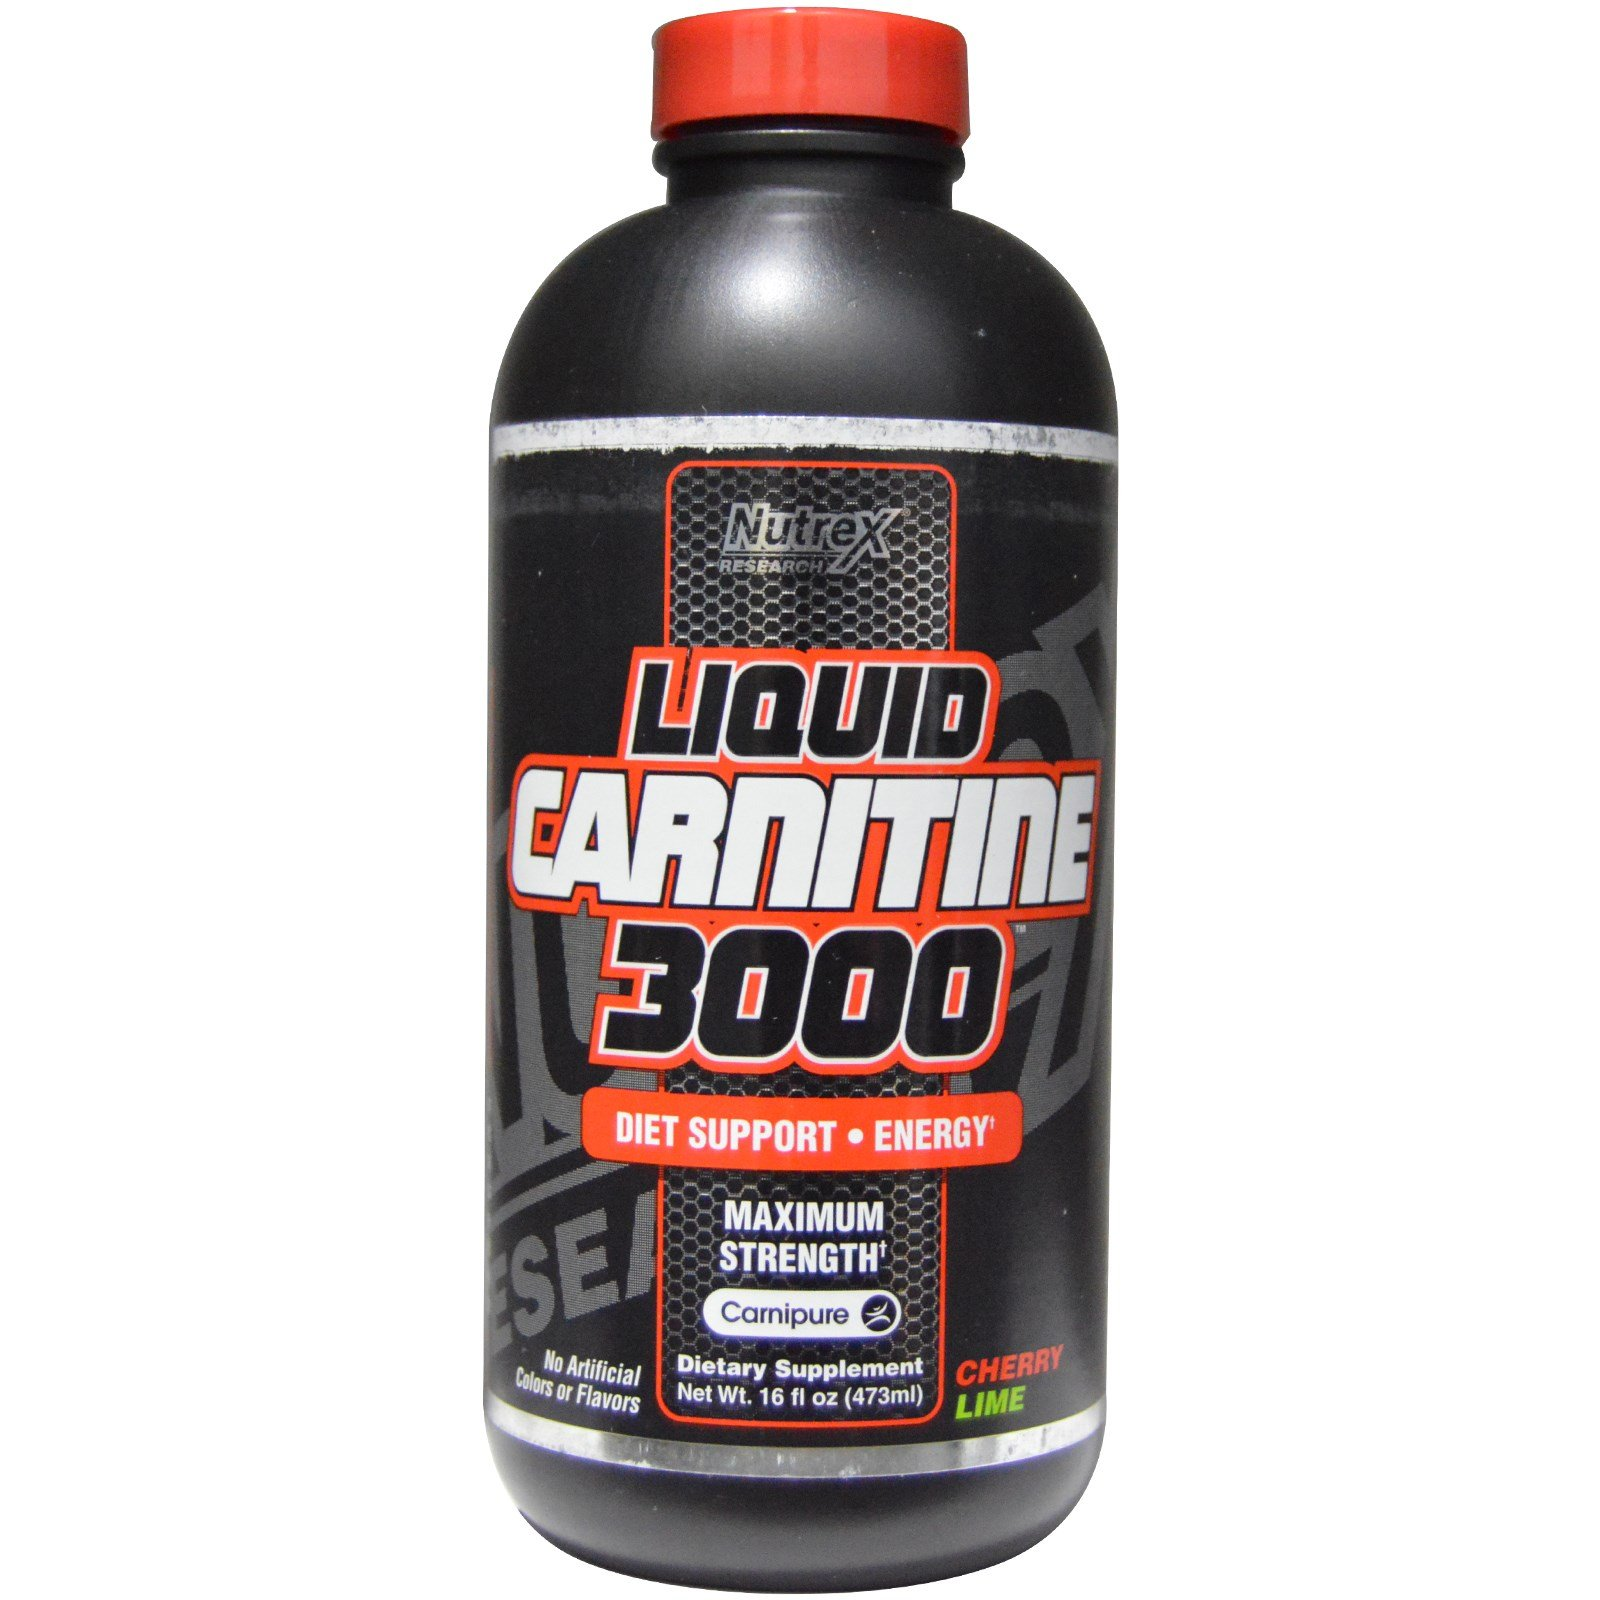 Nutrex Research Labs, Liquid Carnitine 3000, Cherry Lime, 16 fl oz (473 ml) - 2pc